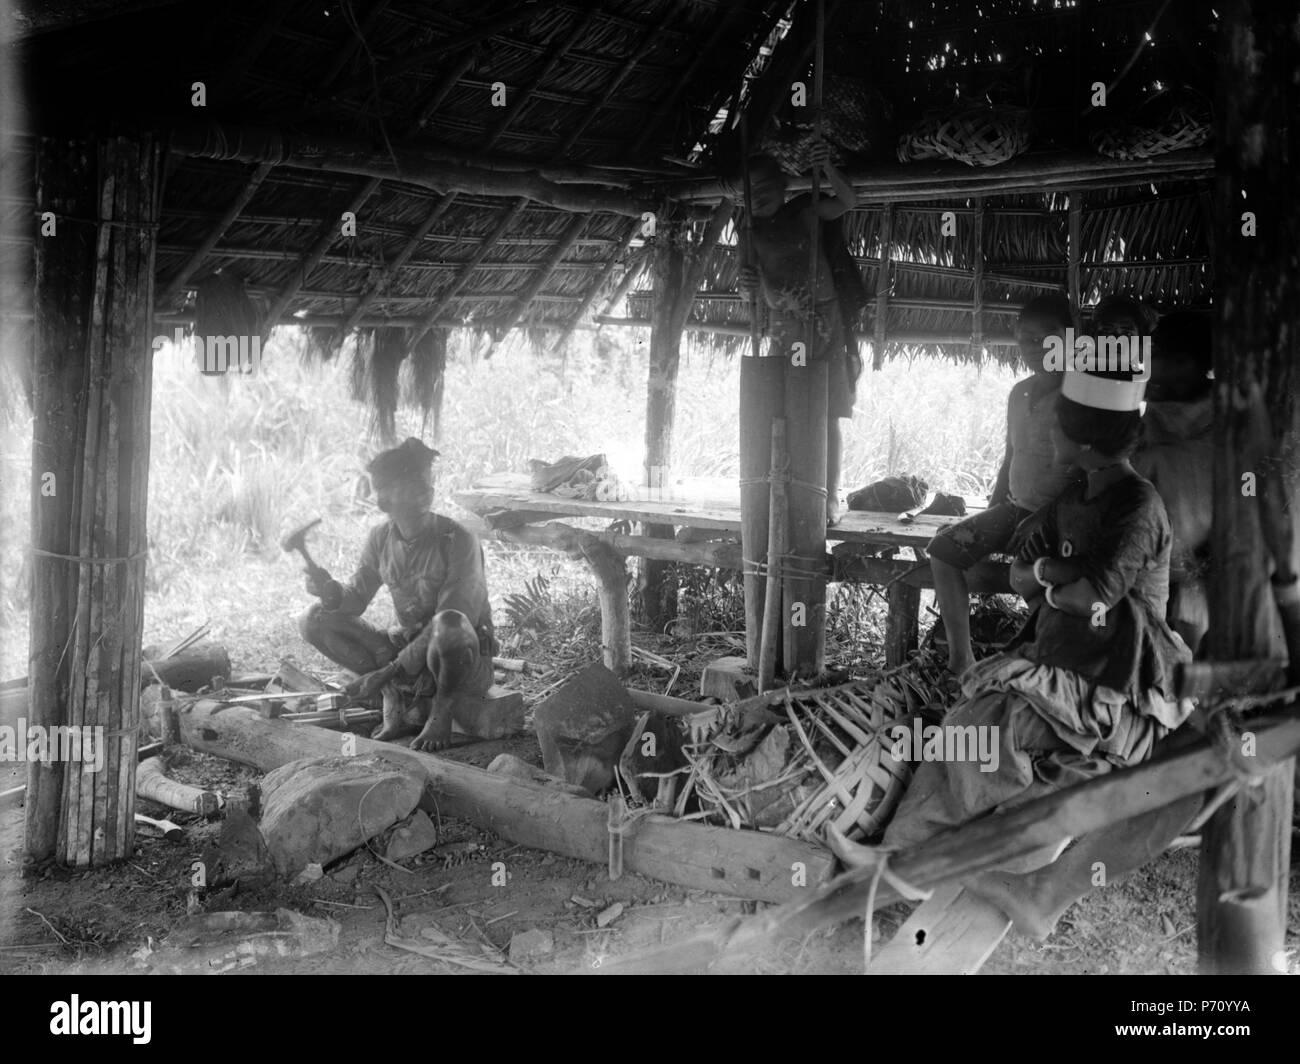 51 Smedja. Lindu, Sulawesi. Indonesien - SMVK - 000203 - Stock Image